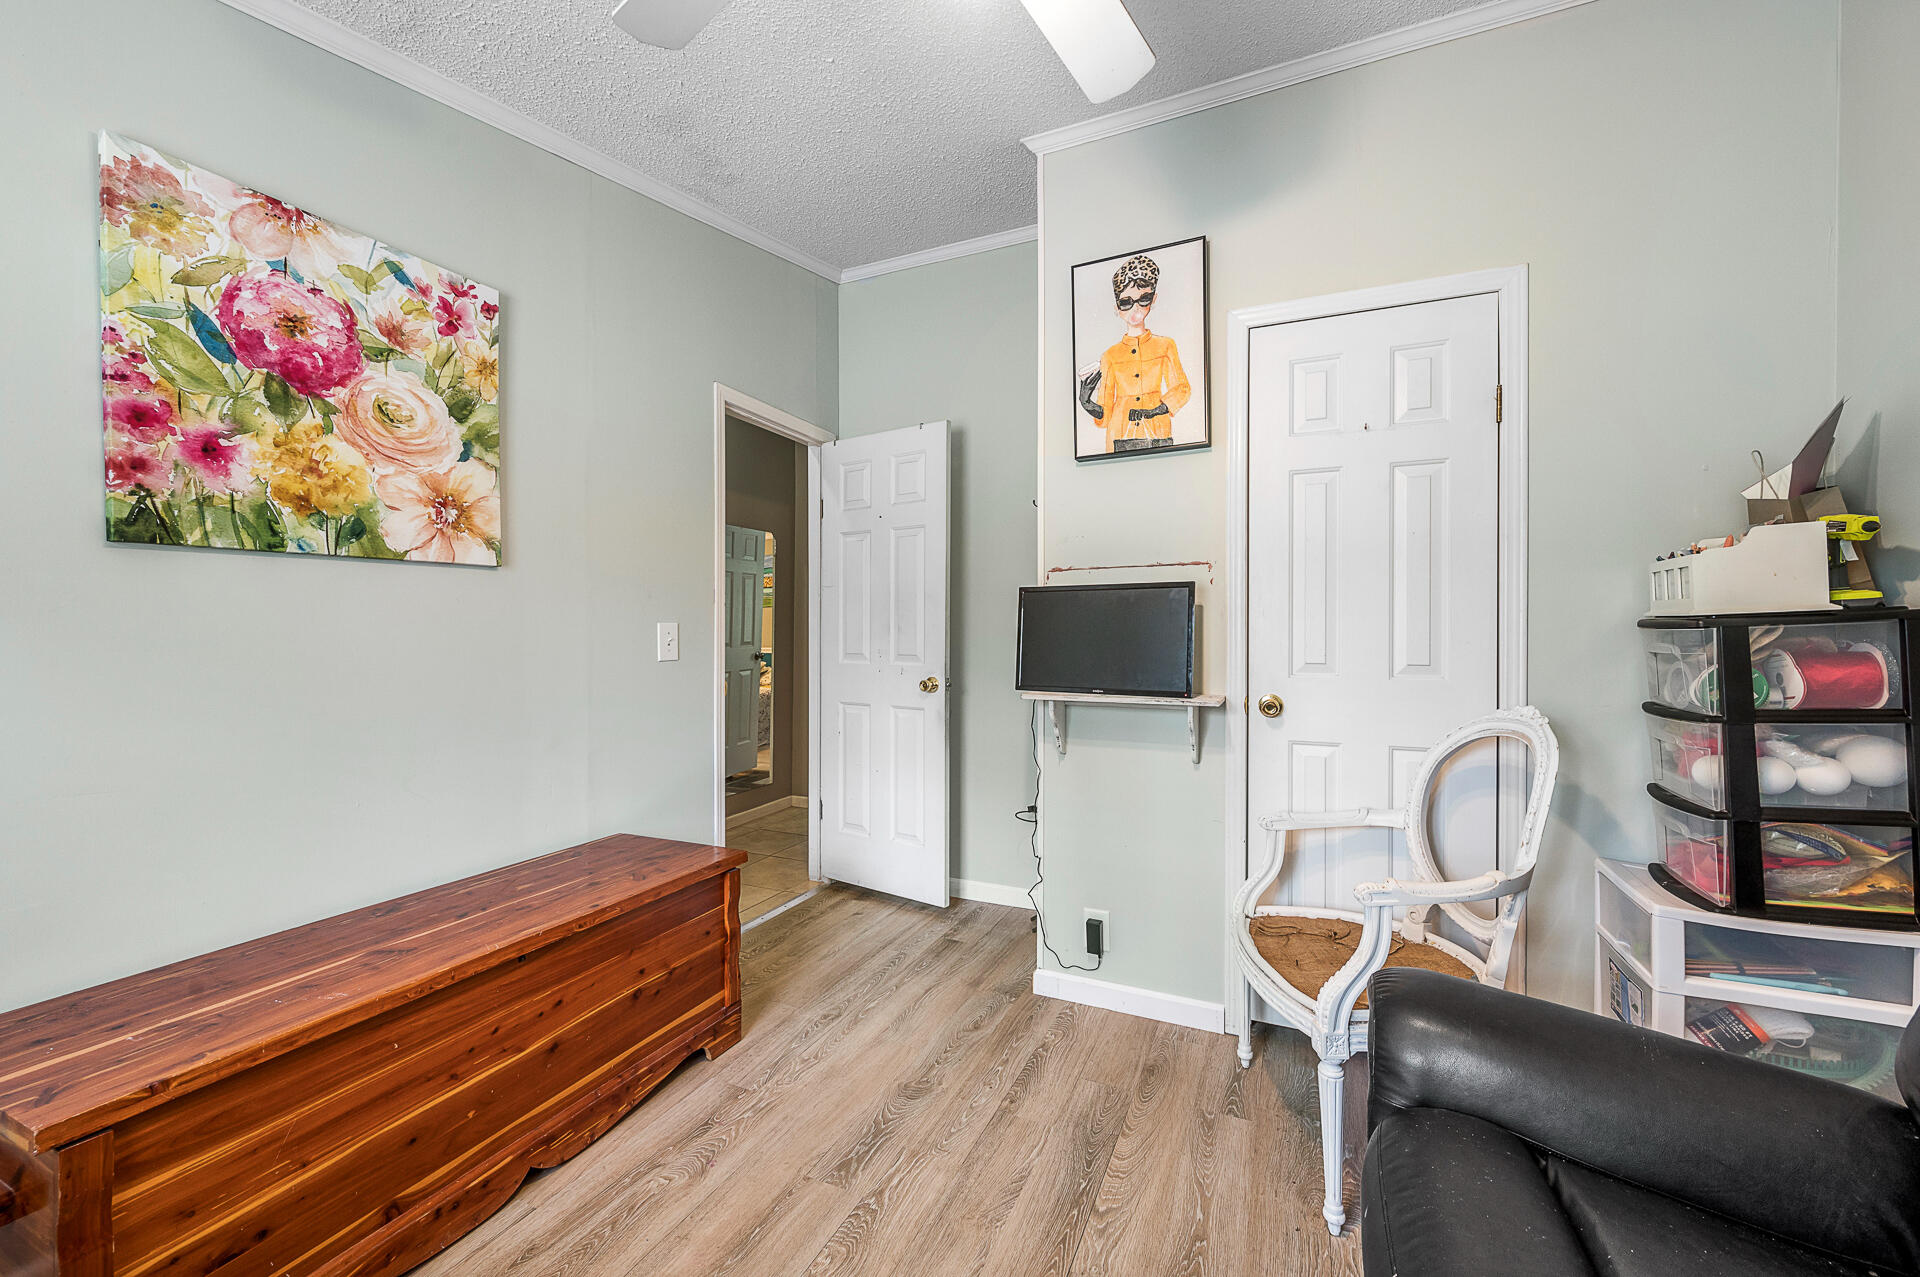 Clemson Terrace Homes For Sale - 250 Medina, Summerville, SC - 11